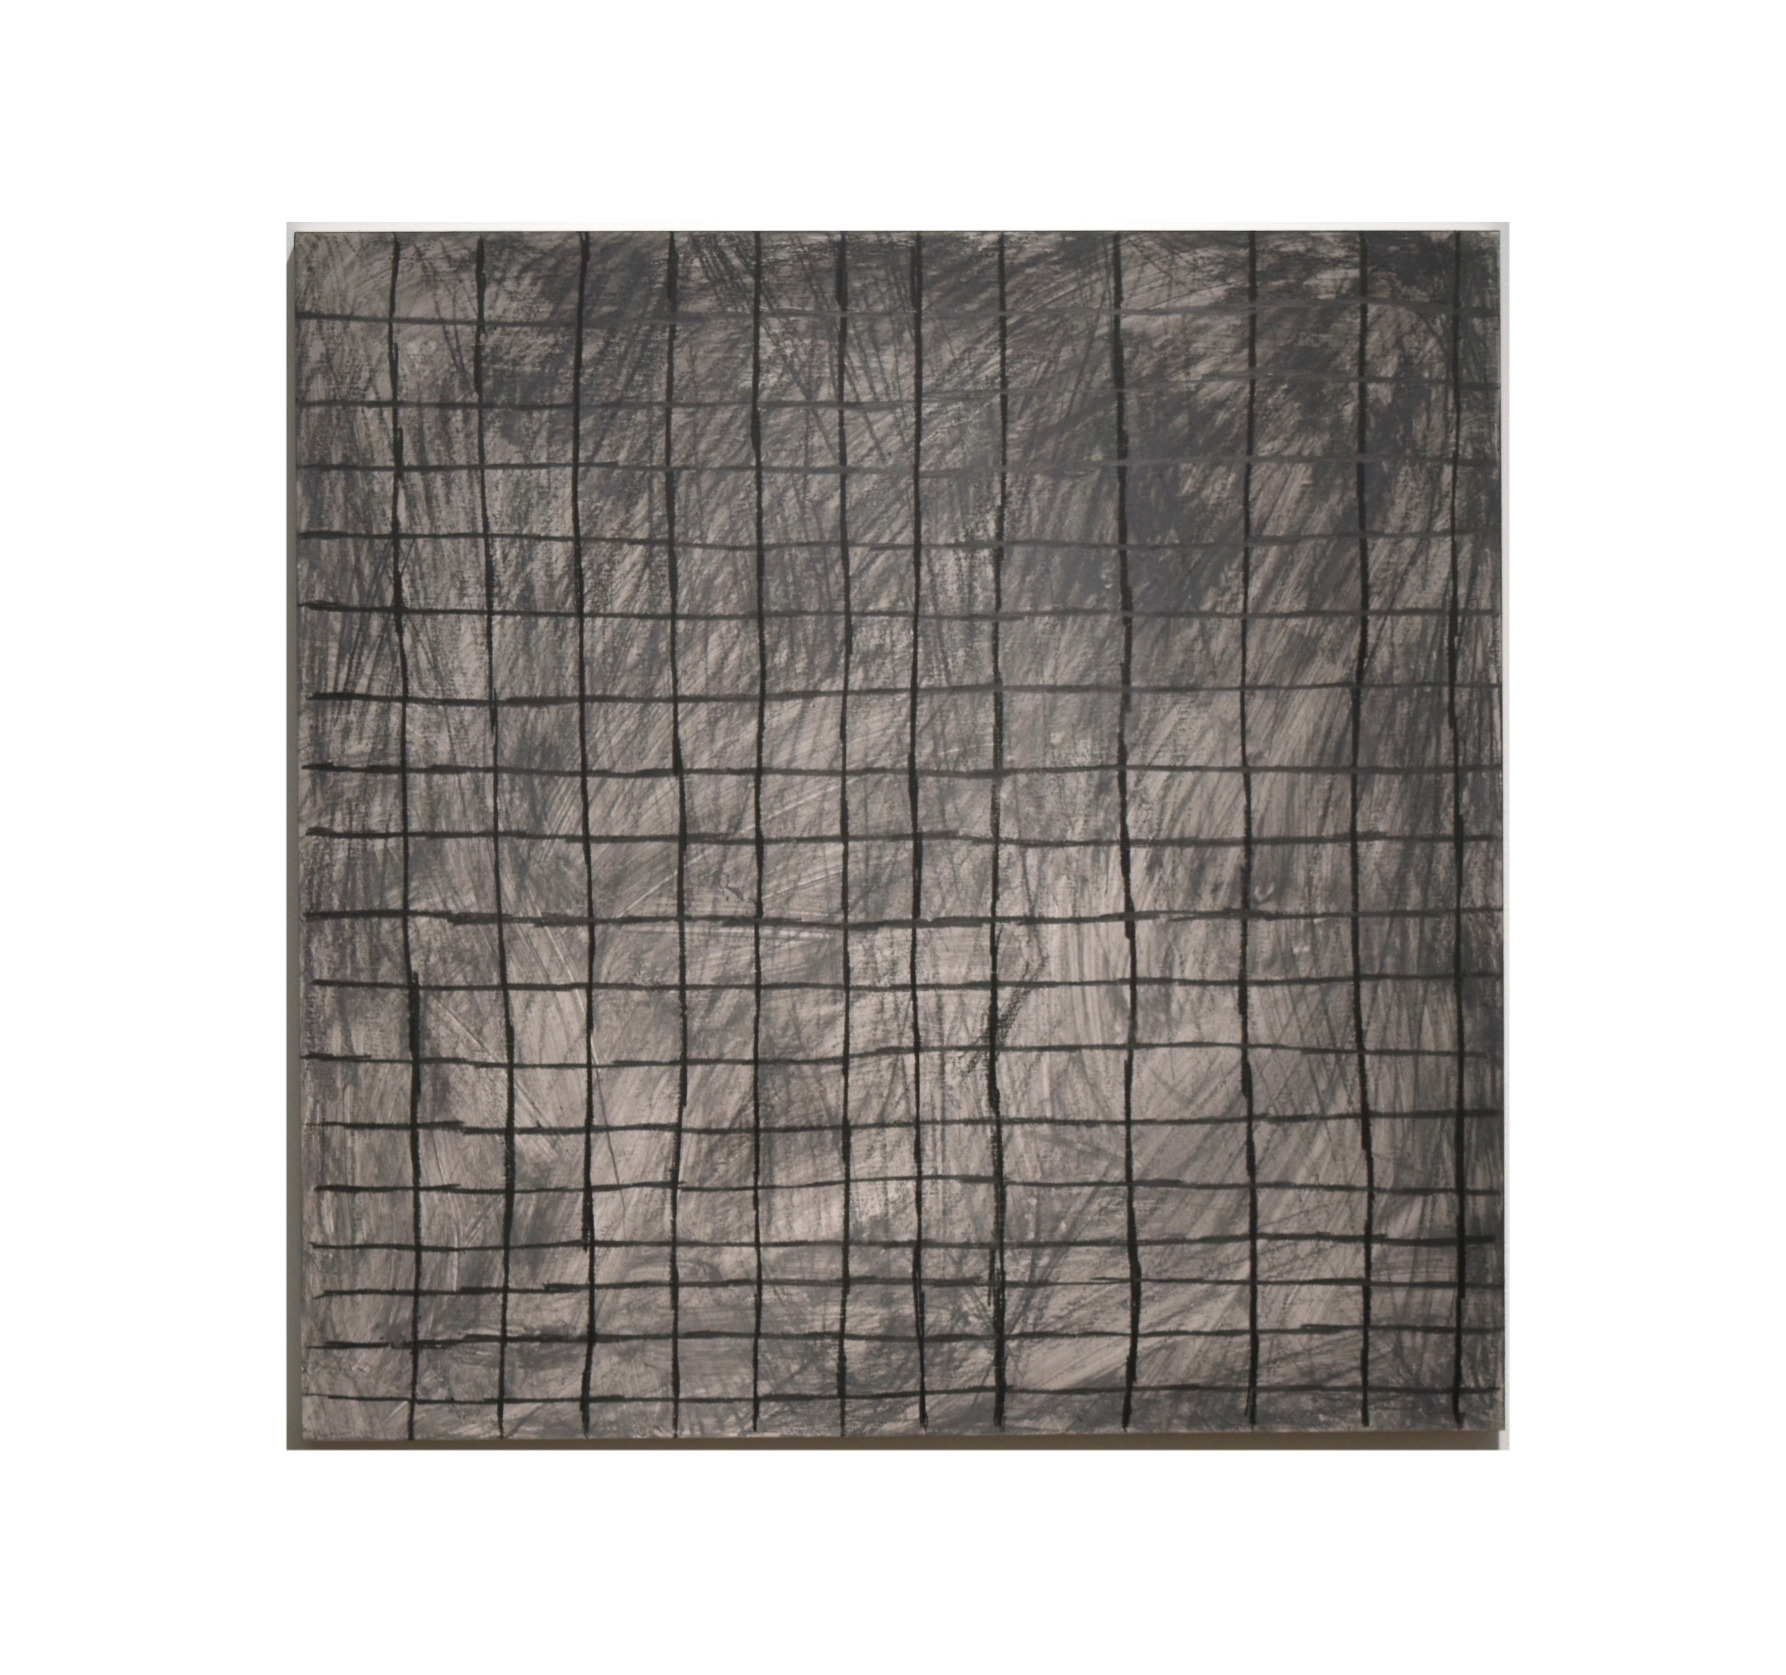 Grid #20817